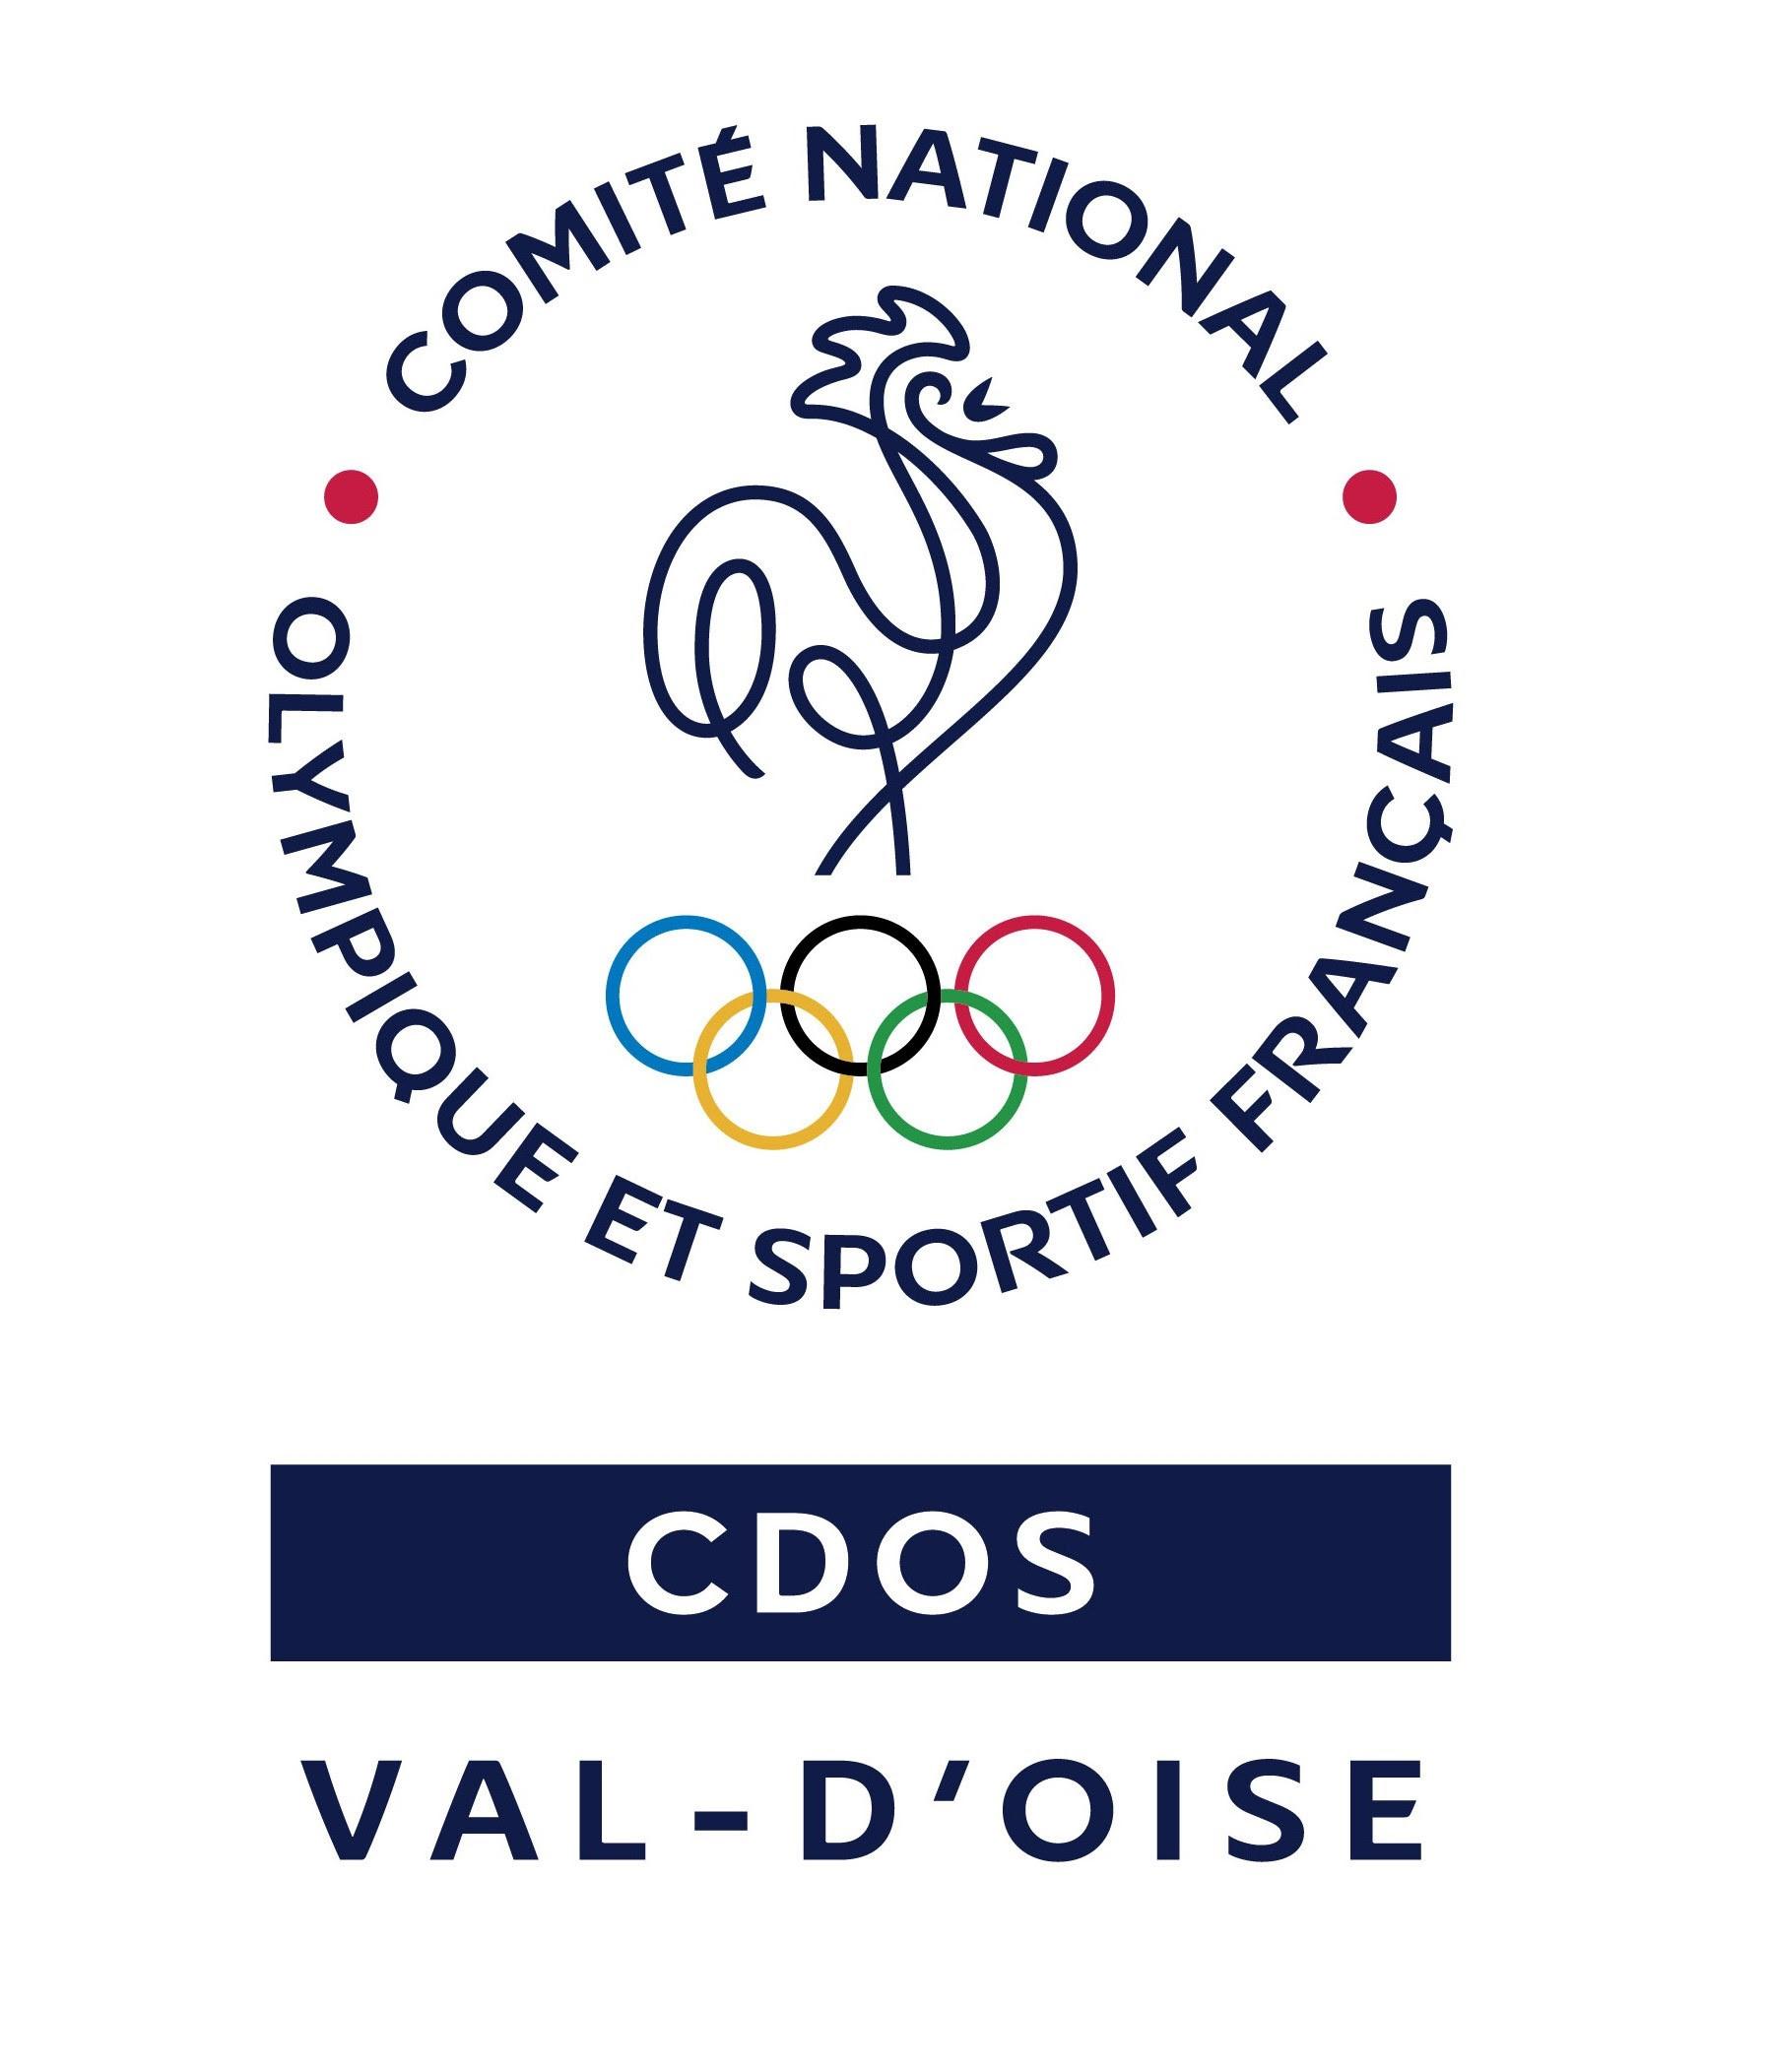 (c) Cdos95.org